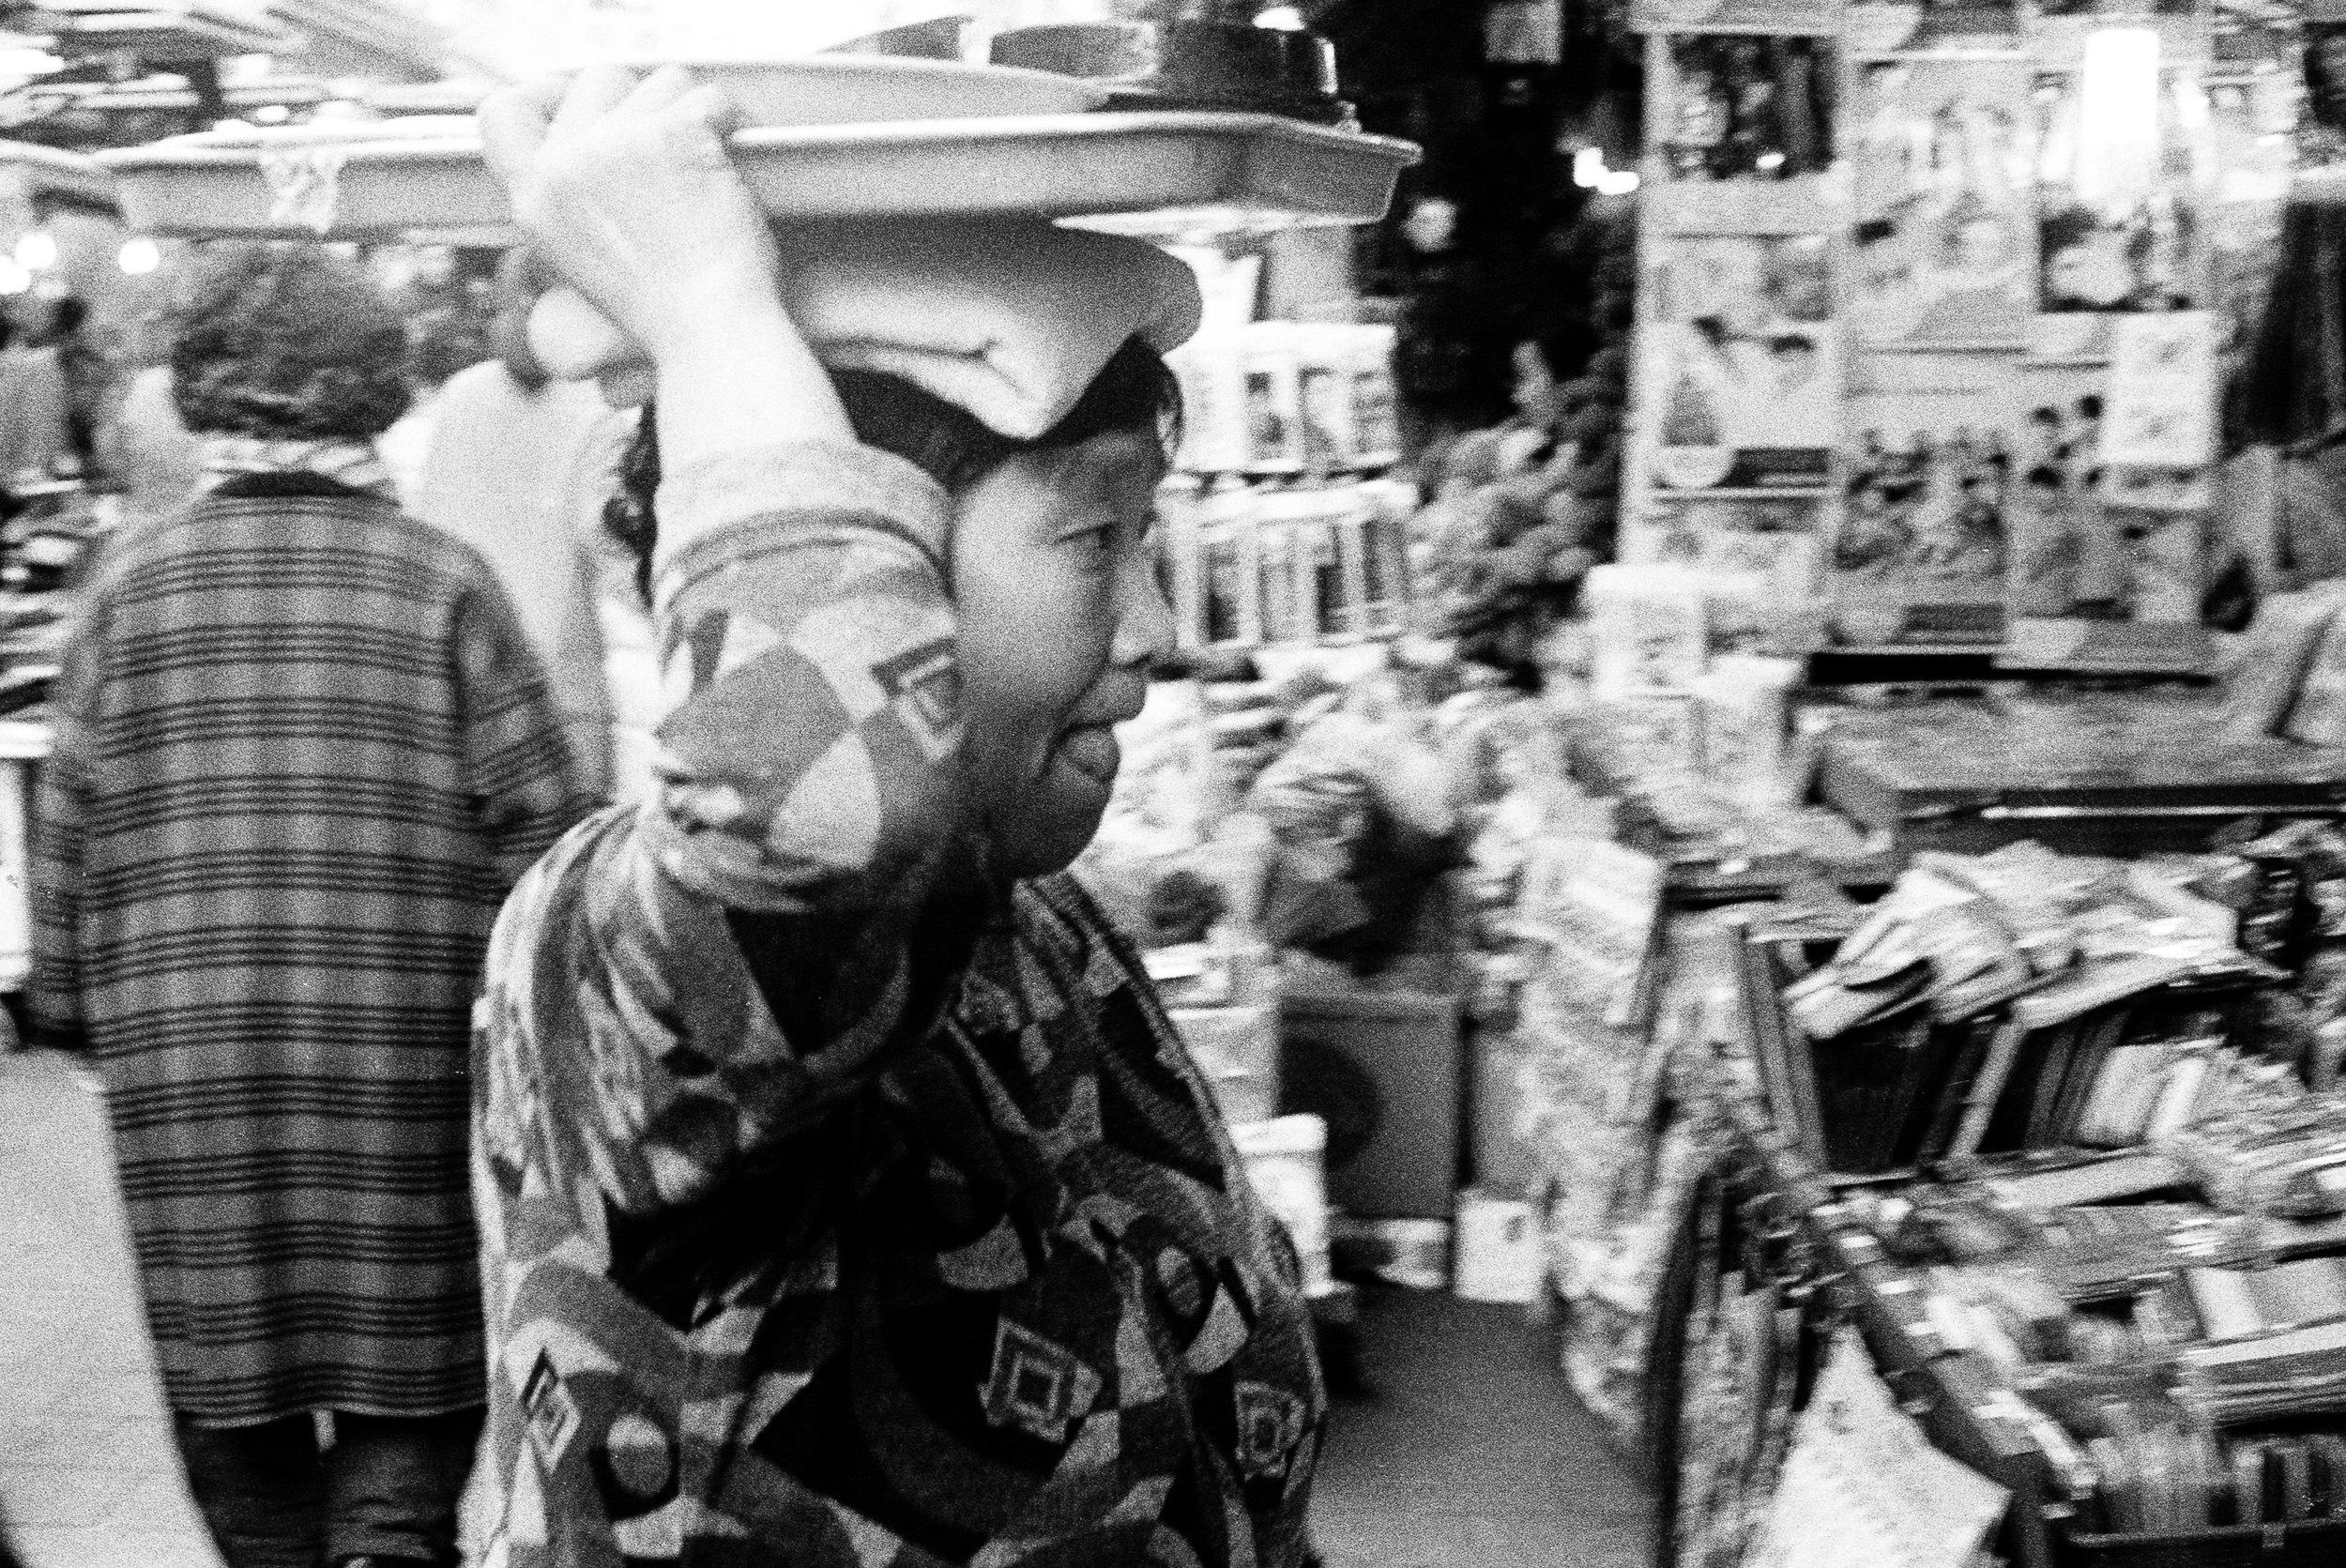 11-streetasiafilm-006.jpg